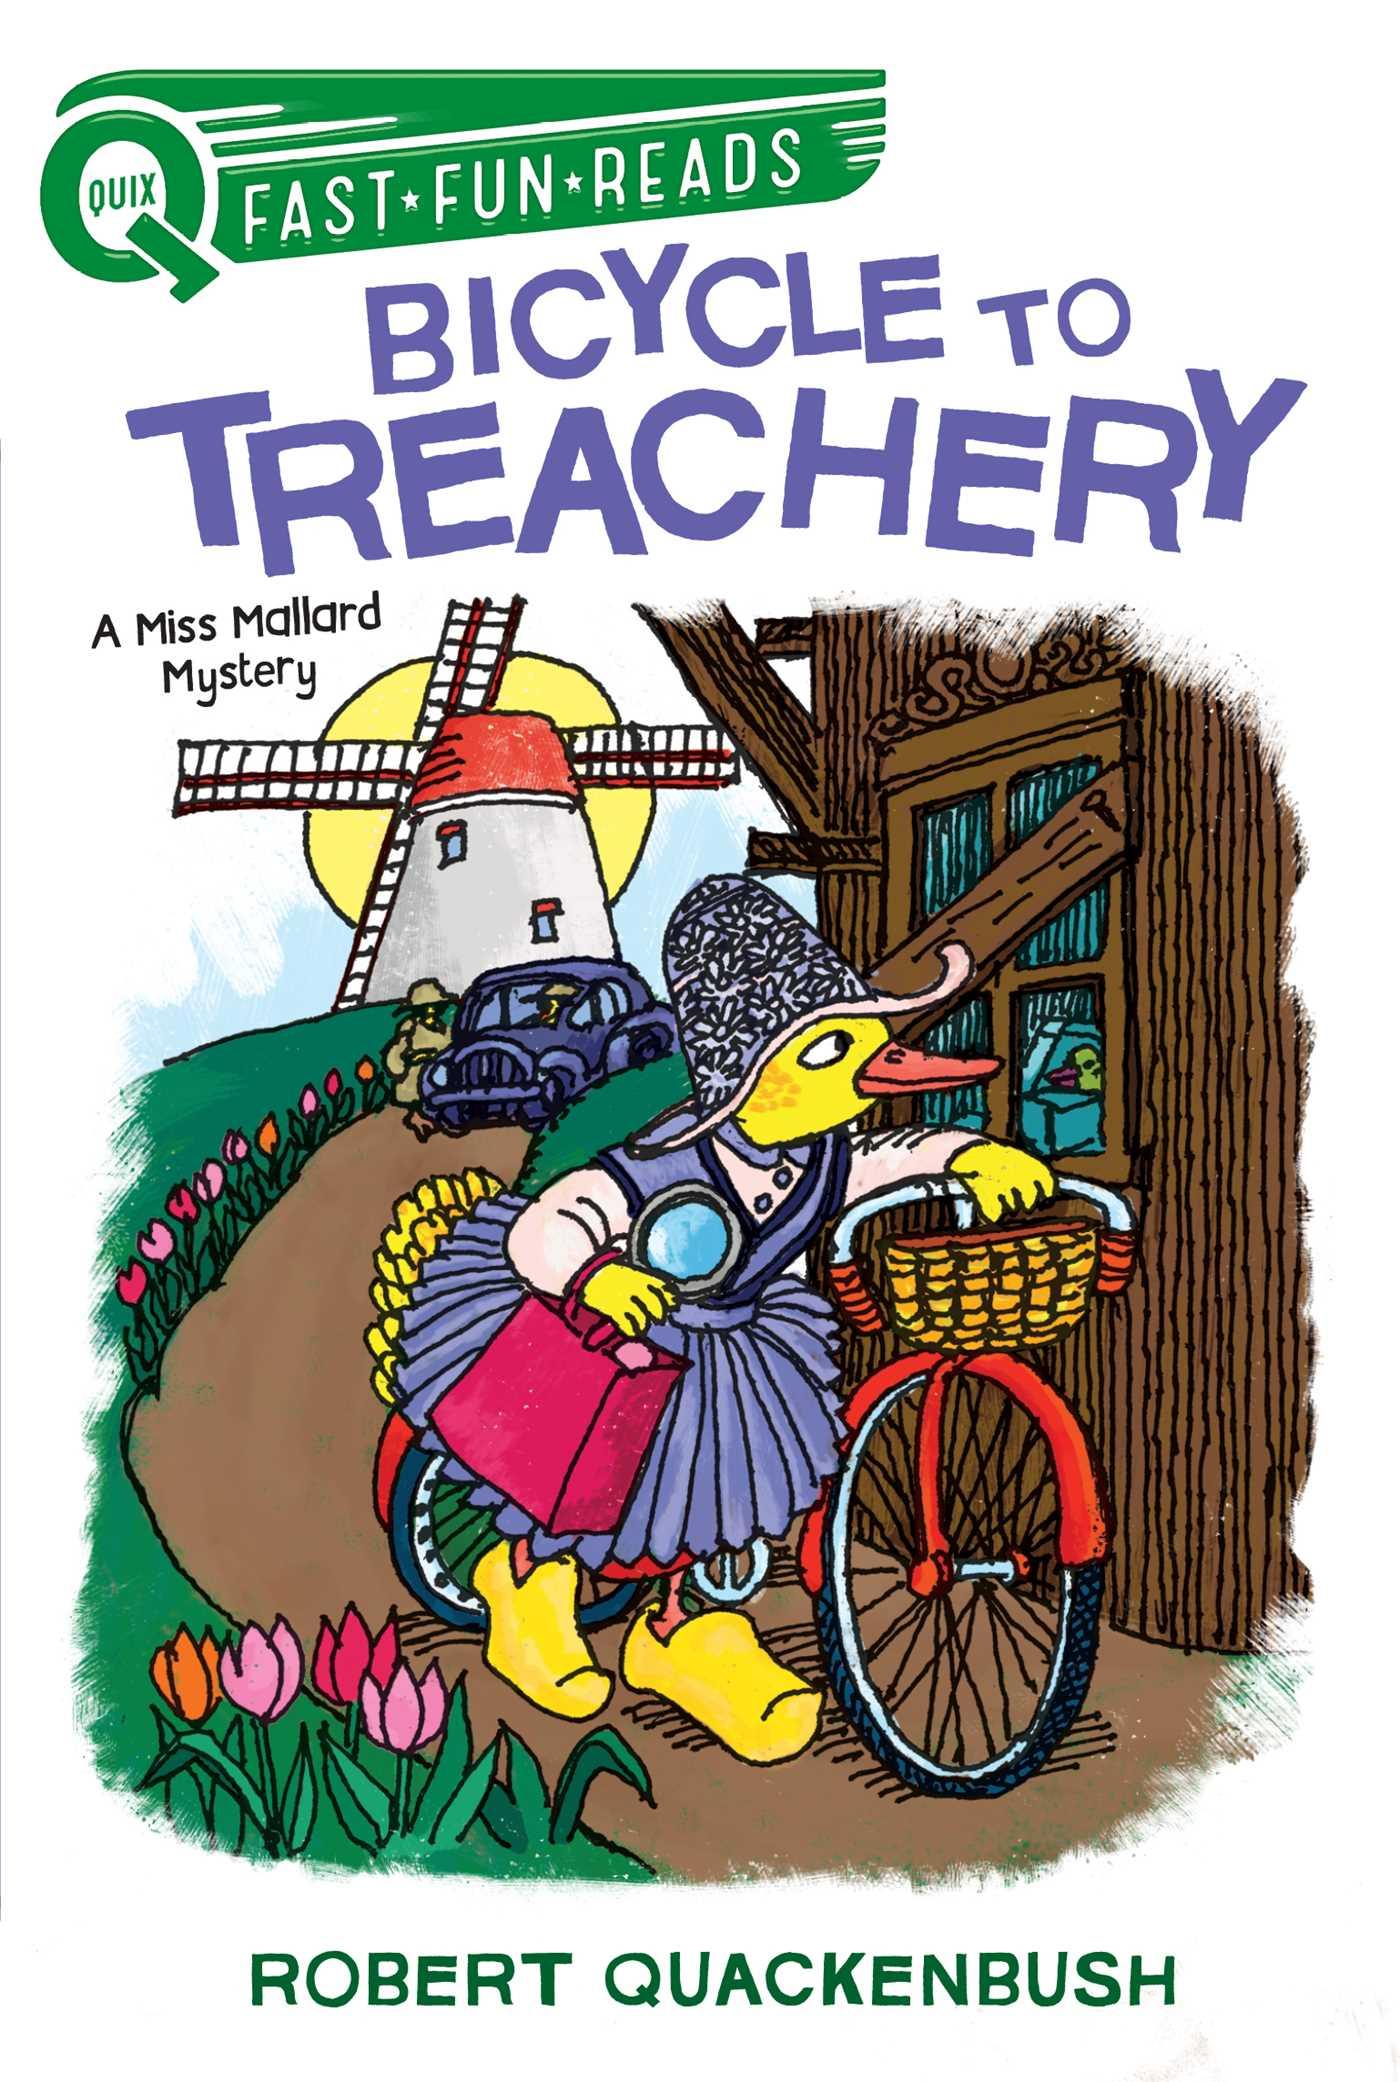 Bicycle to treachery 9781534413979 hr